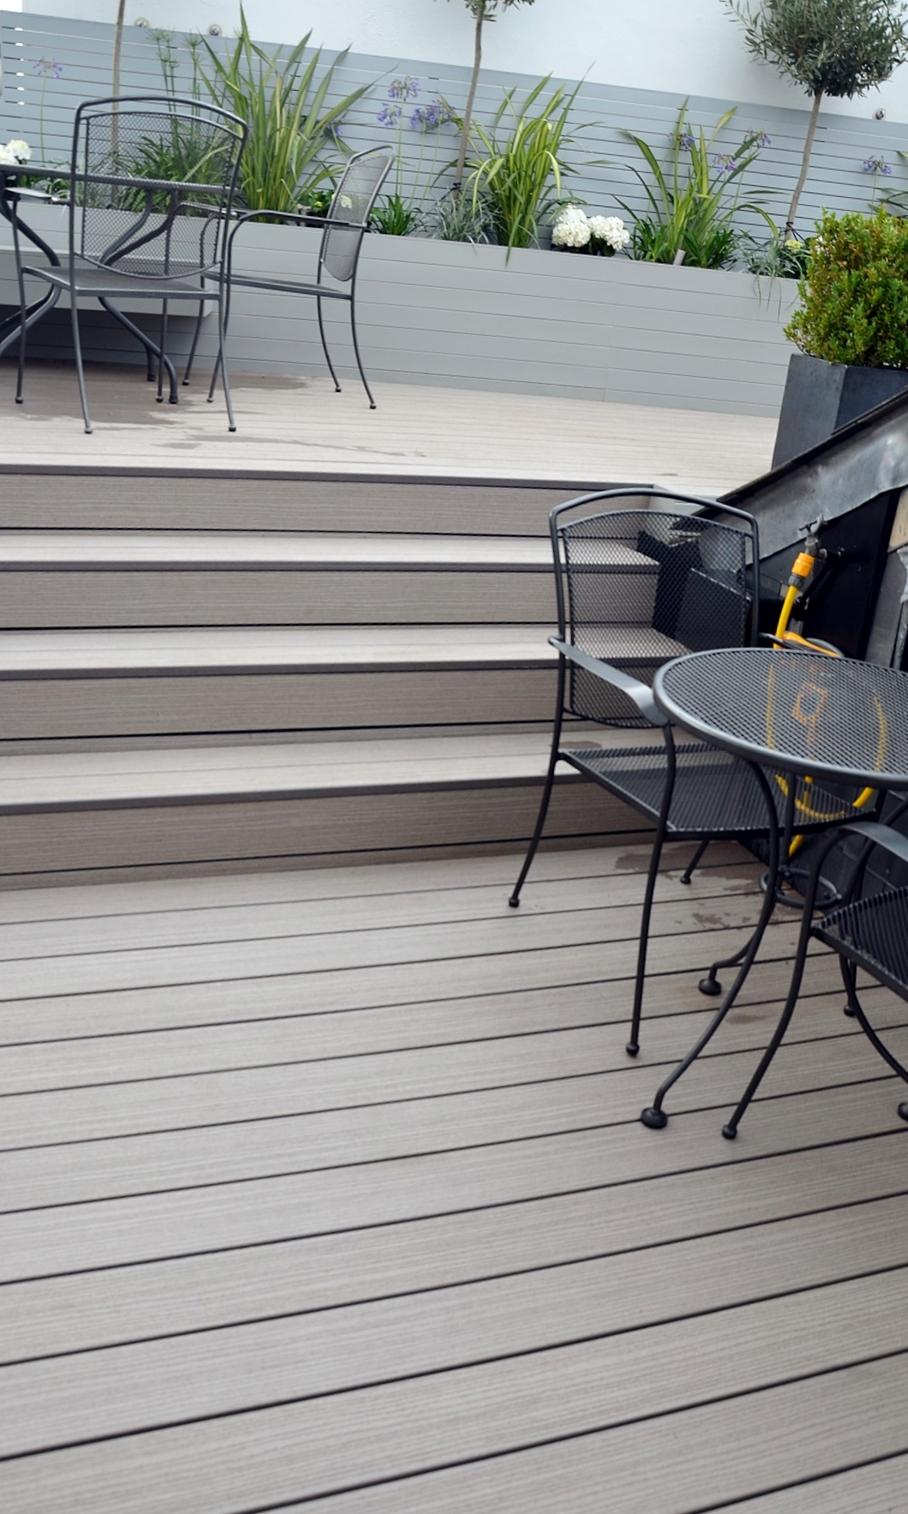 modern garden design docklands penthouse balcony decking planting floating bench composite grey materials london